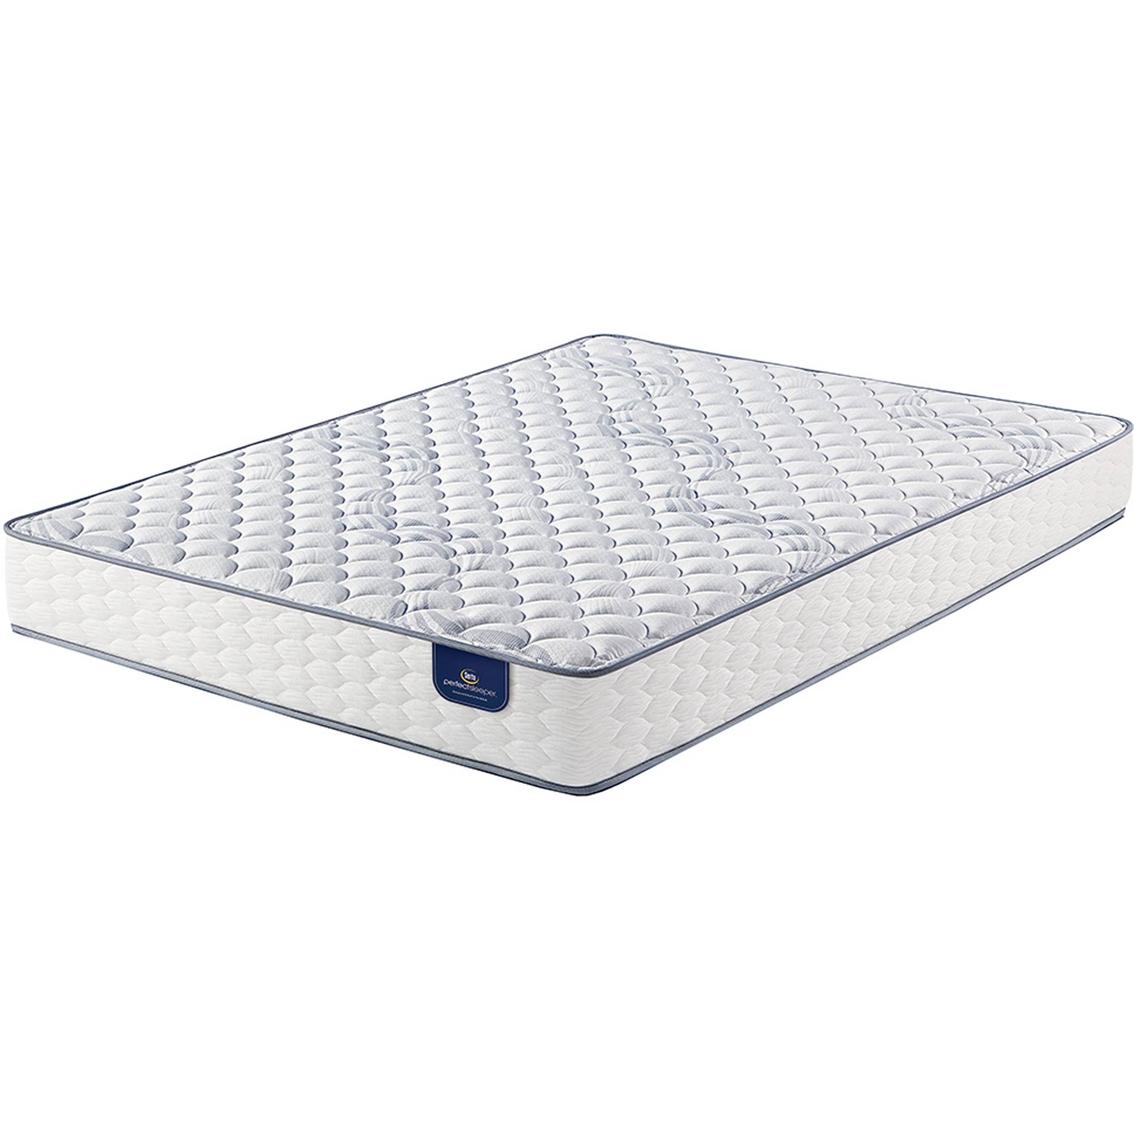 Serta Perfect Sleeper Bridgeville Firm Mattress